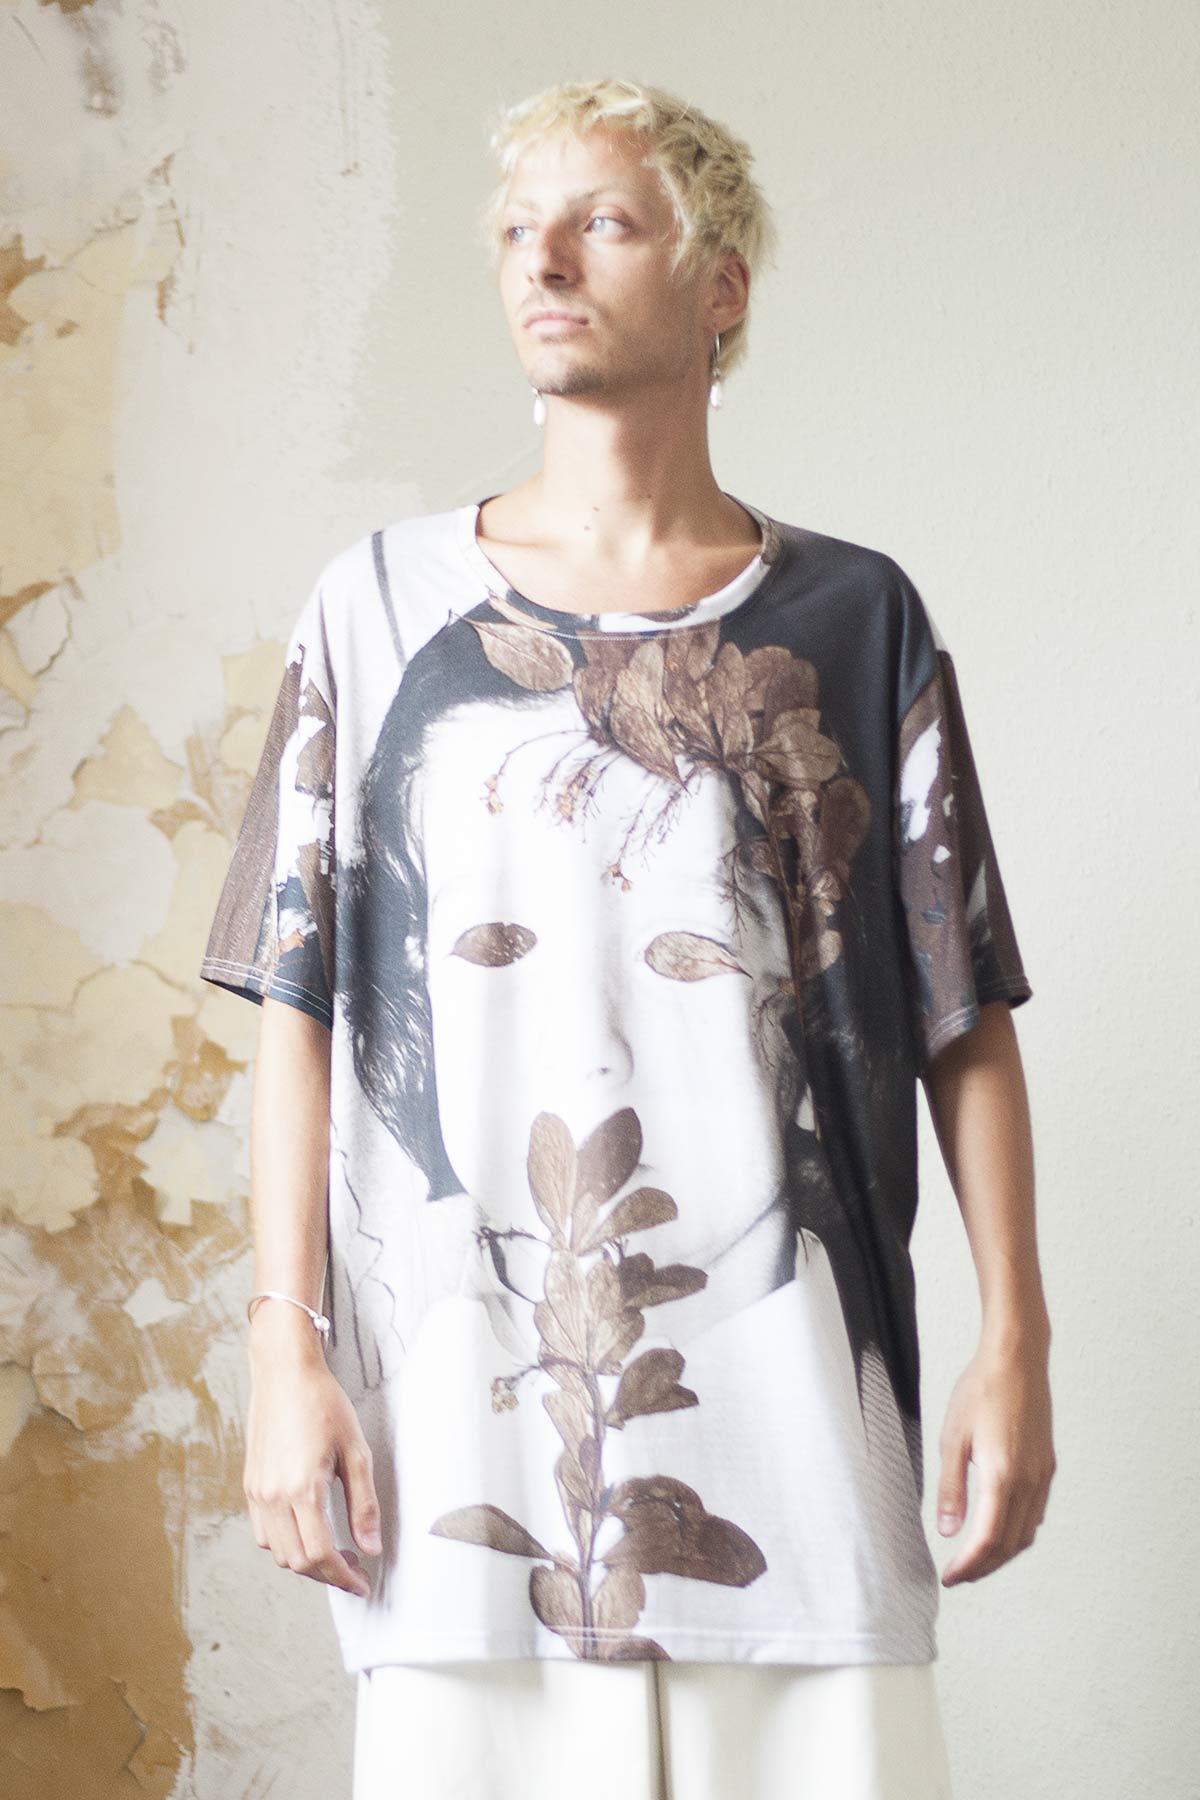 msdm-studio-flora-mccallica-tshirt-02